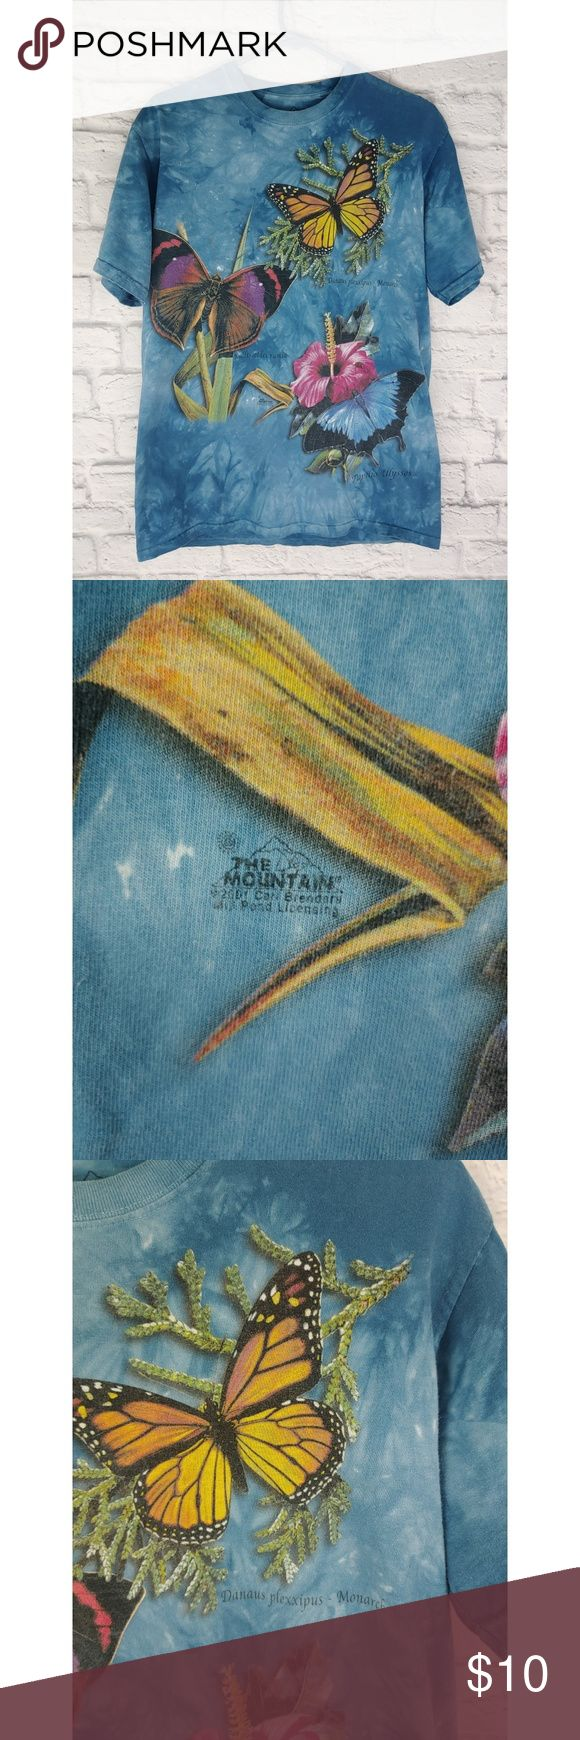 The Mountain 3-D Tee, Vintage 2001, Size Medium The Mountain 3-D Tee, Size Mediu... 3